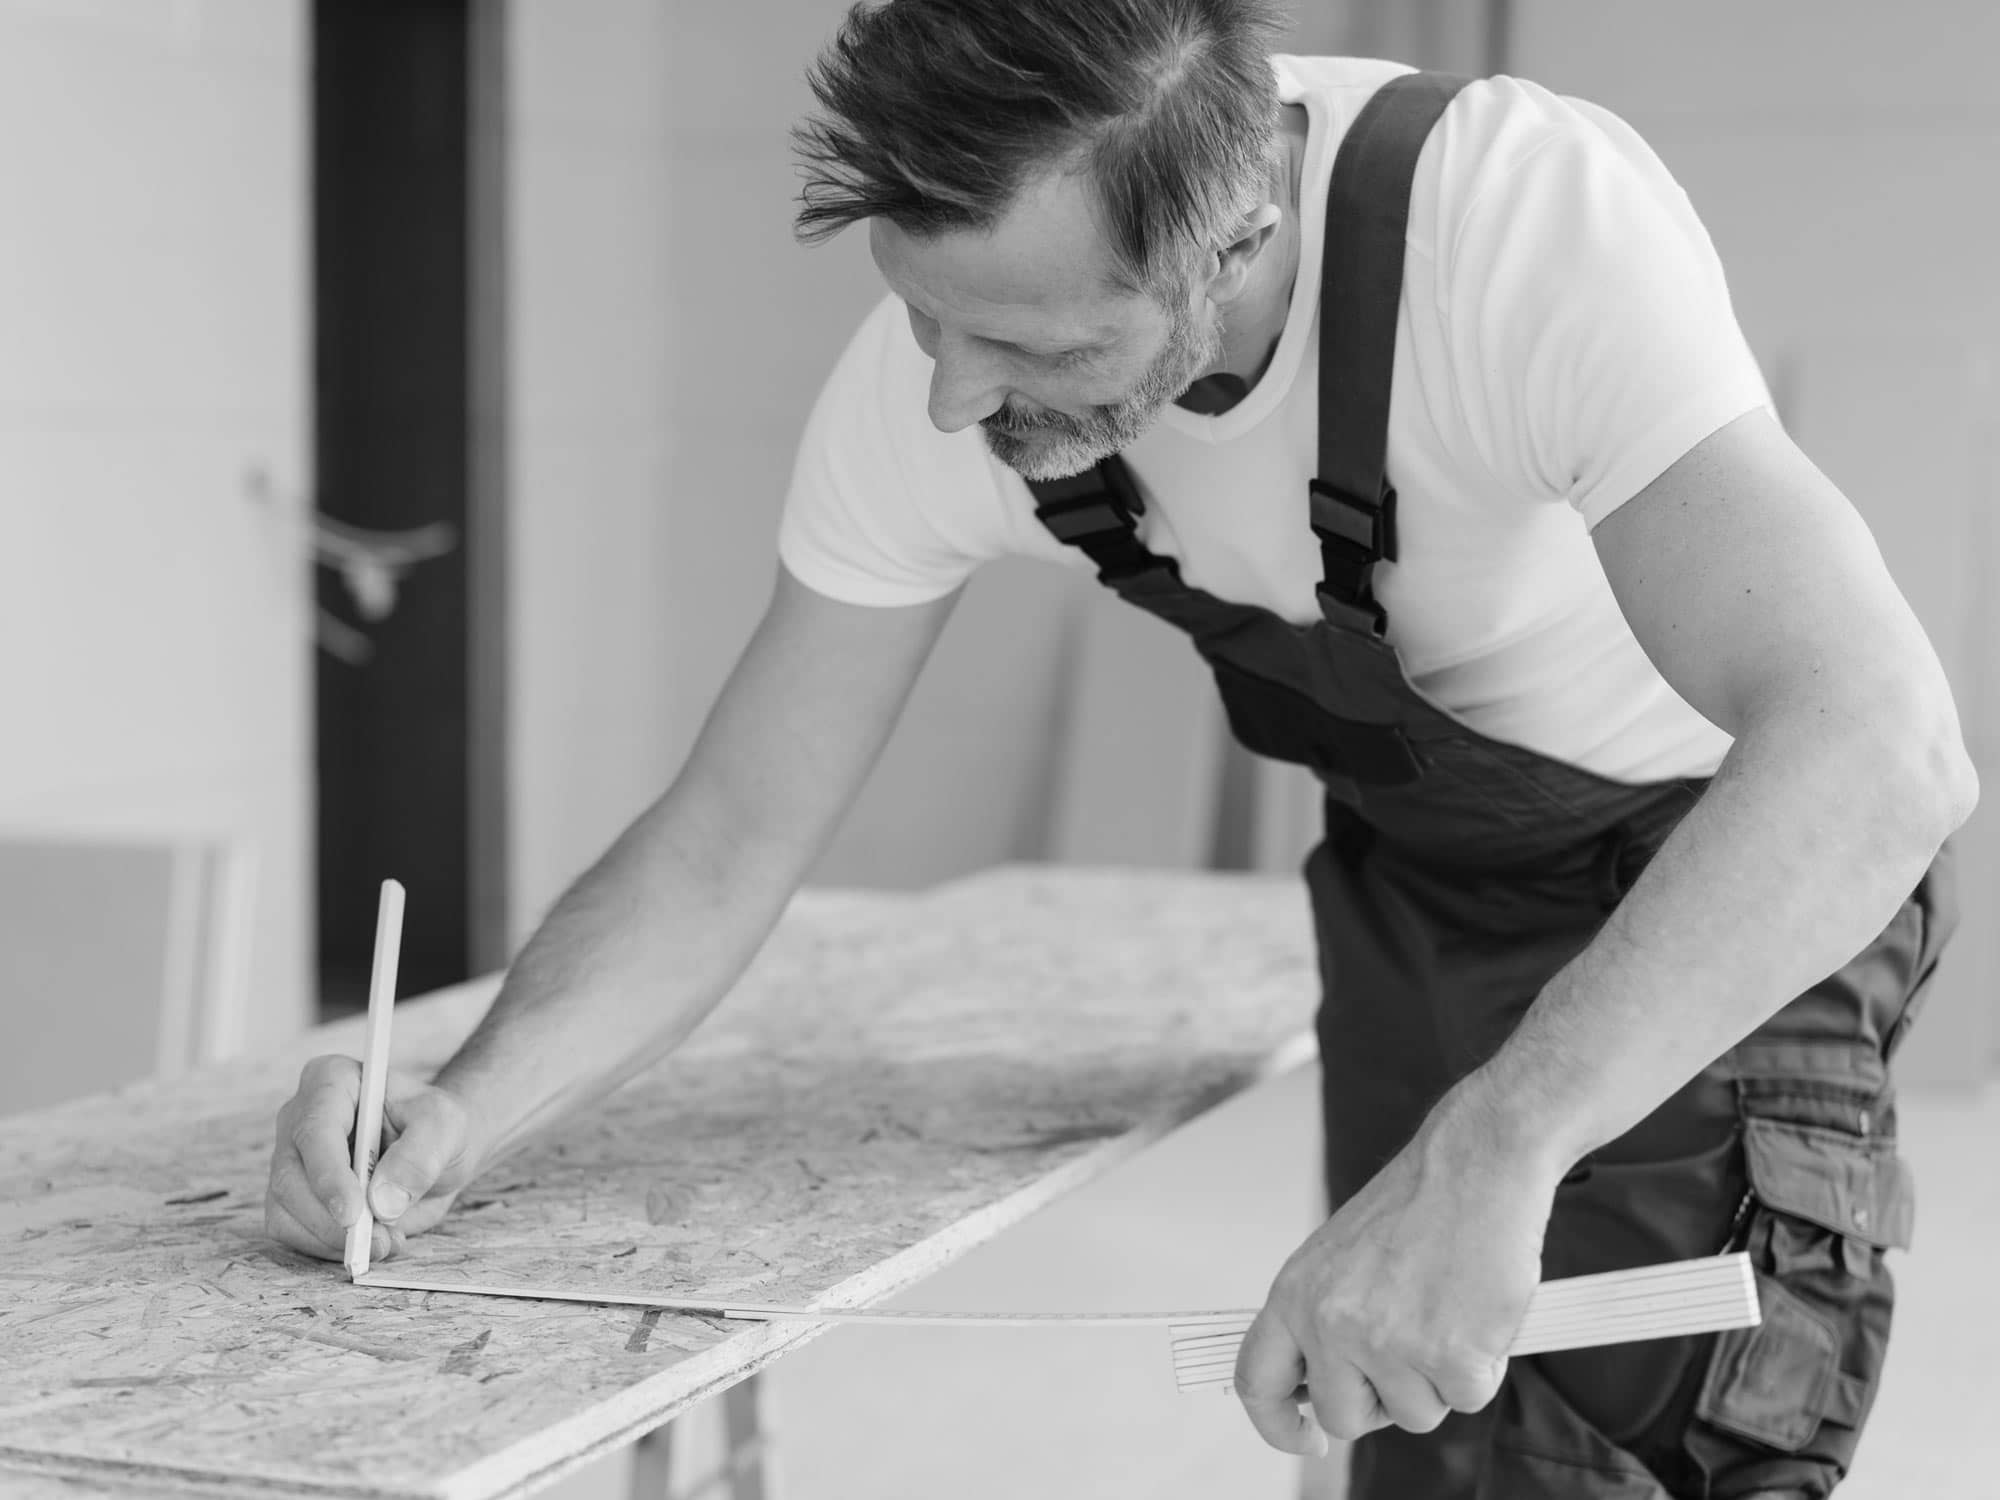 Construction company Photography - Carpenter